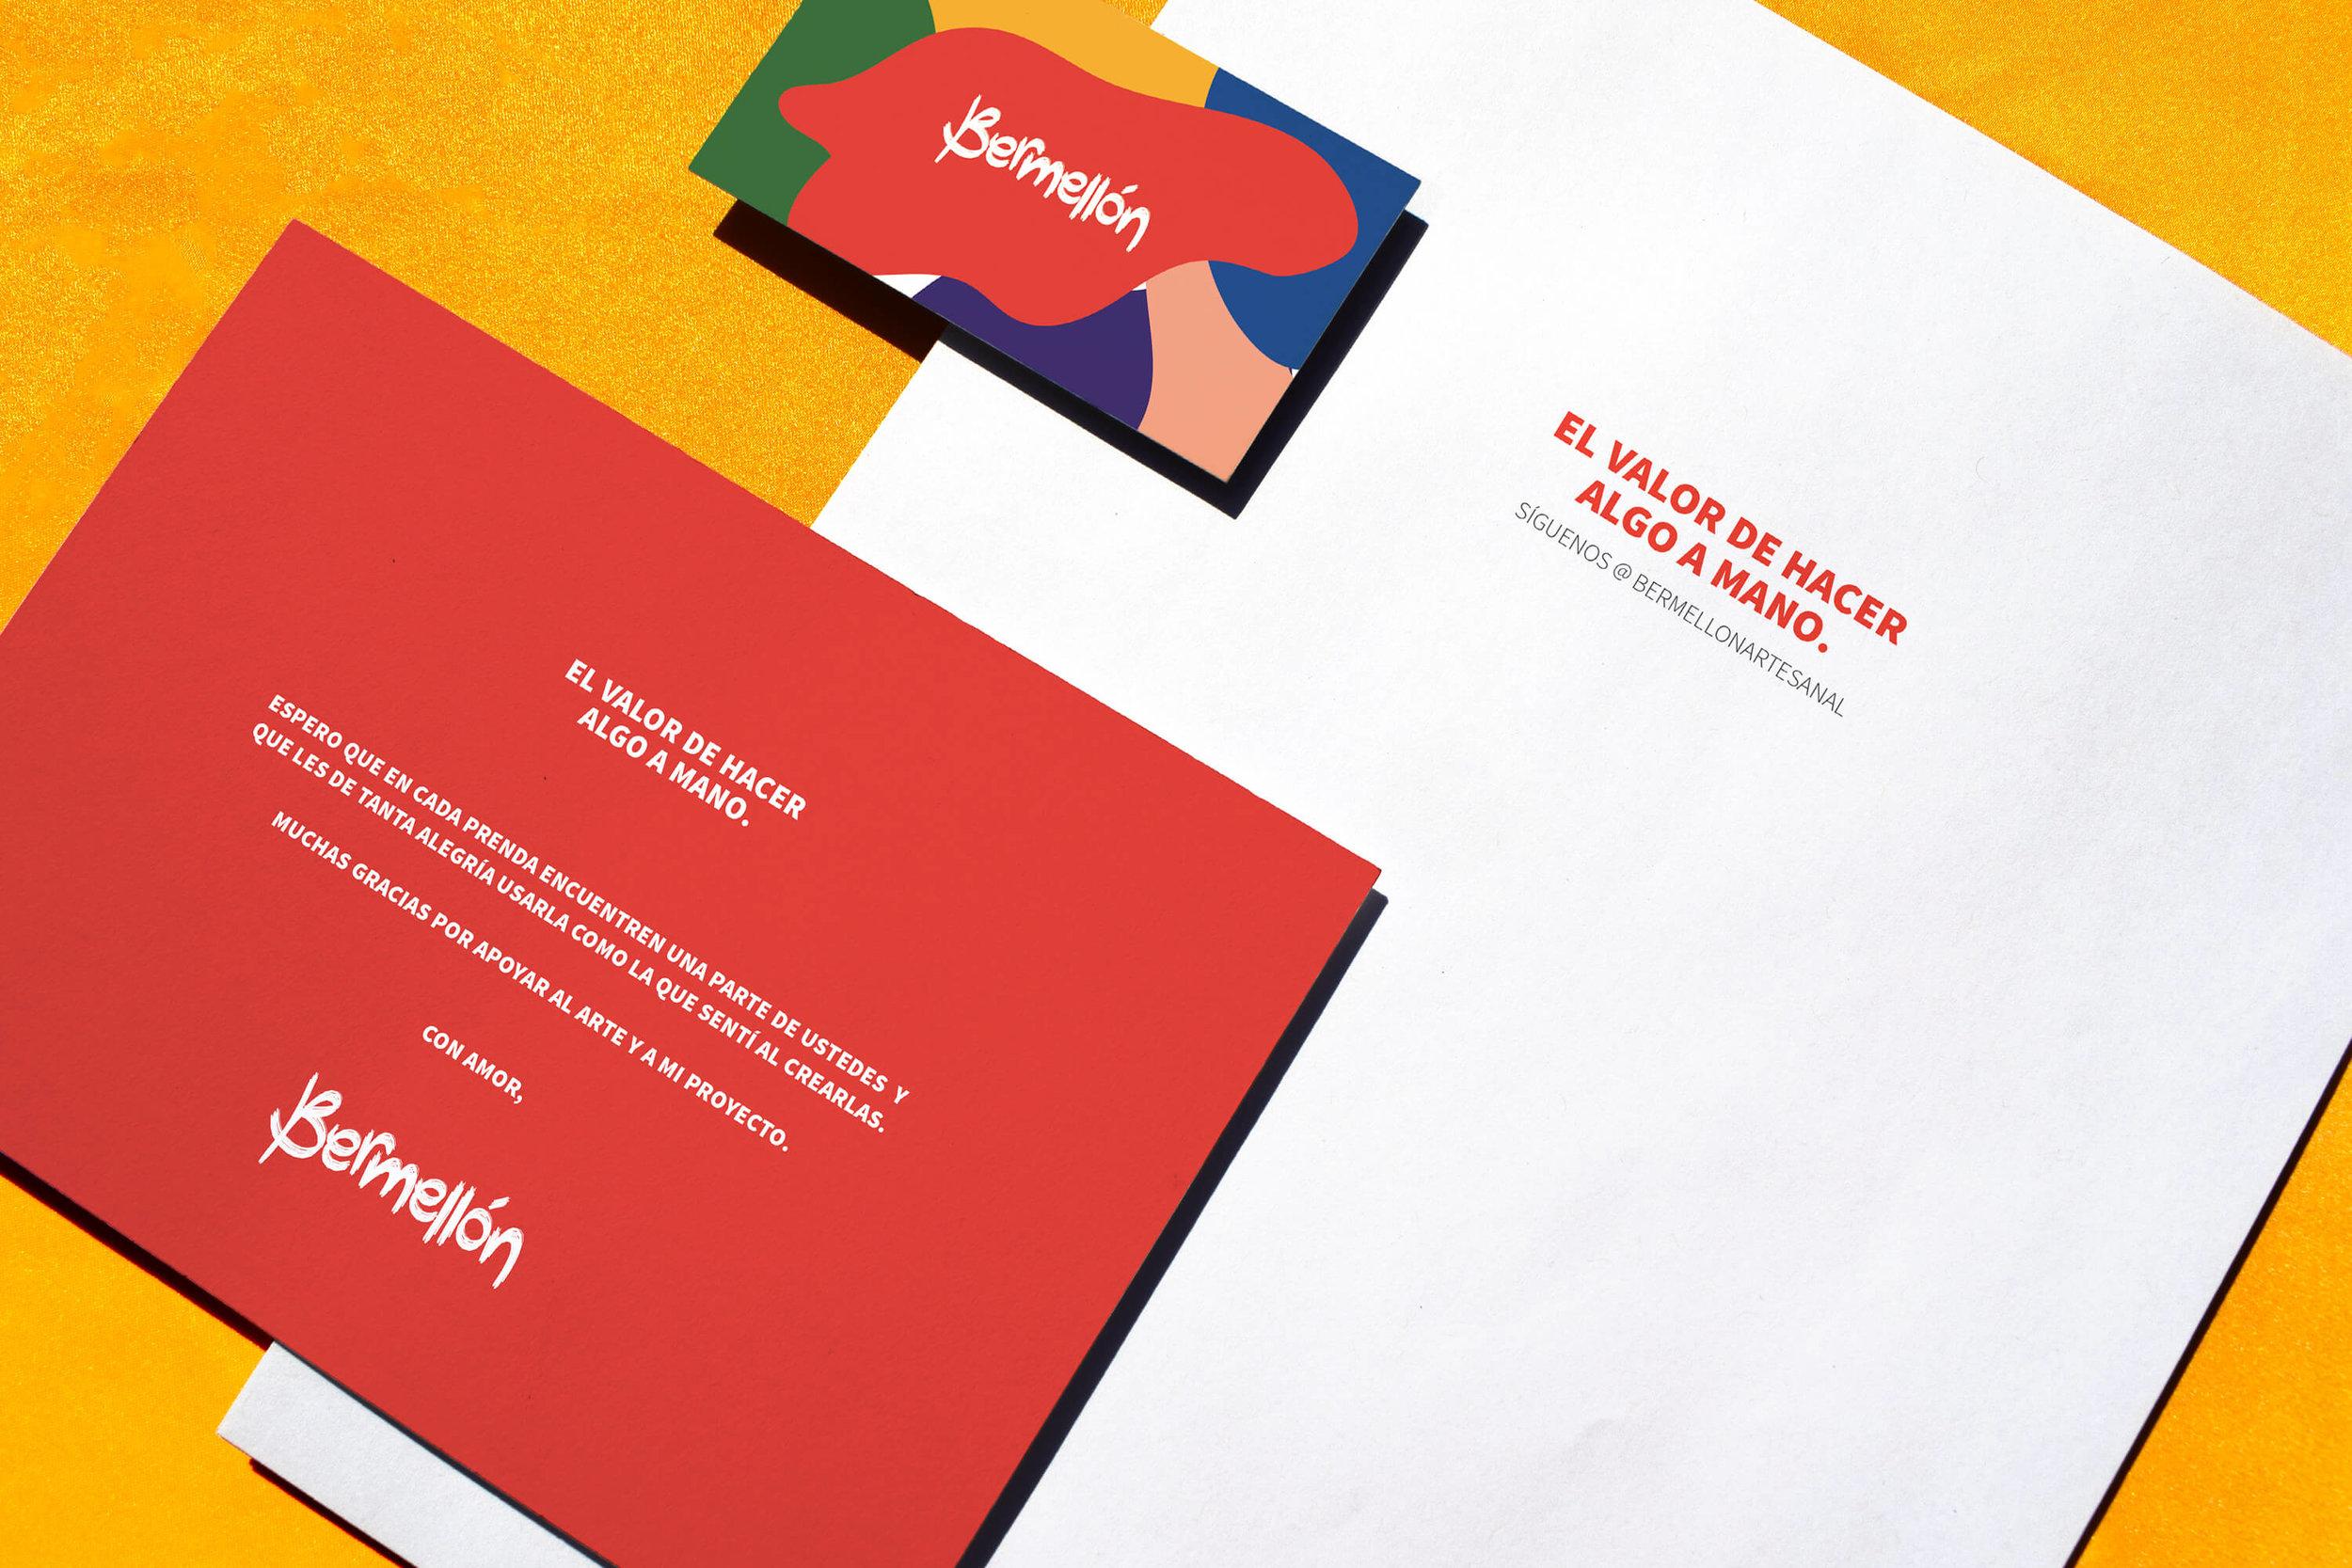 logo-design-branding-san-diego-vortic-bermellon-03-4